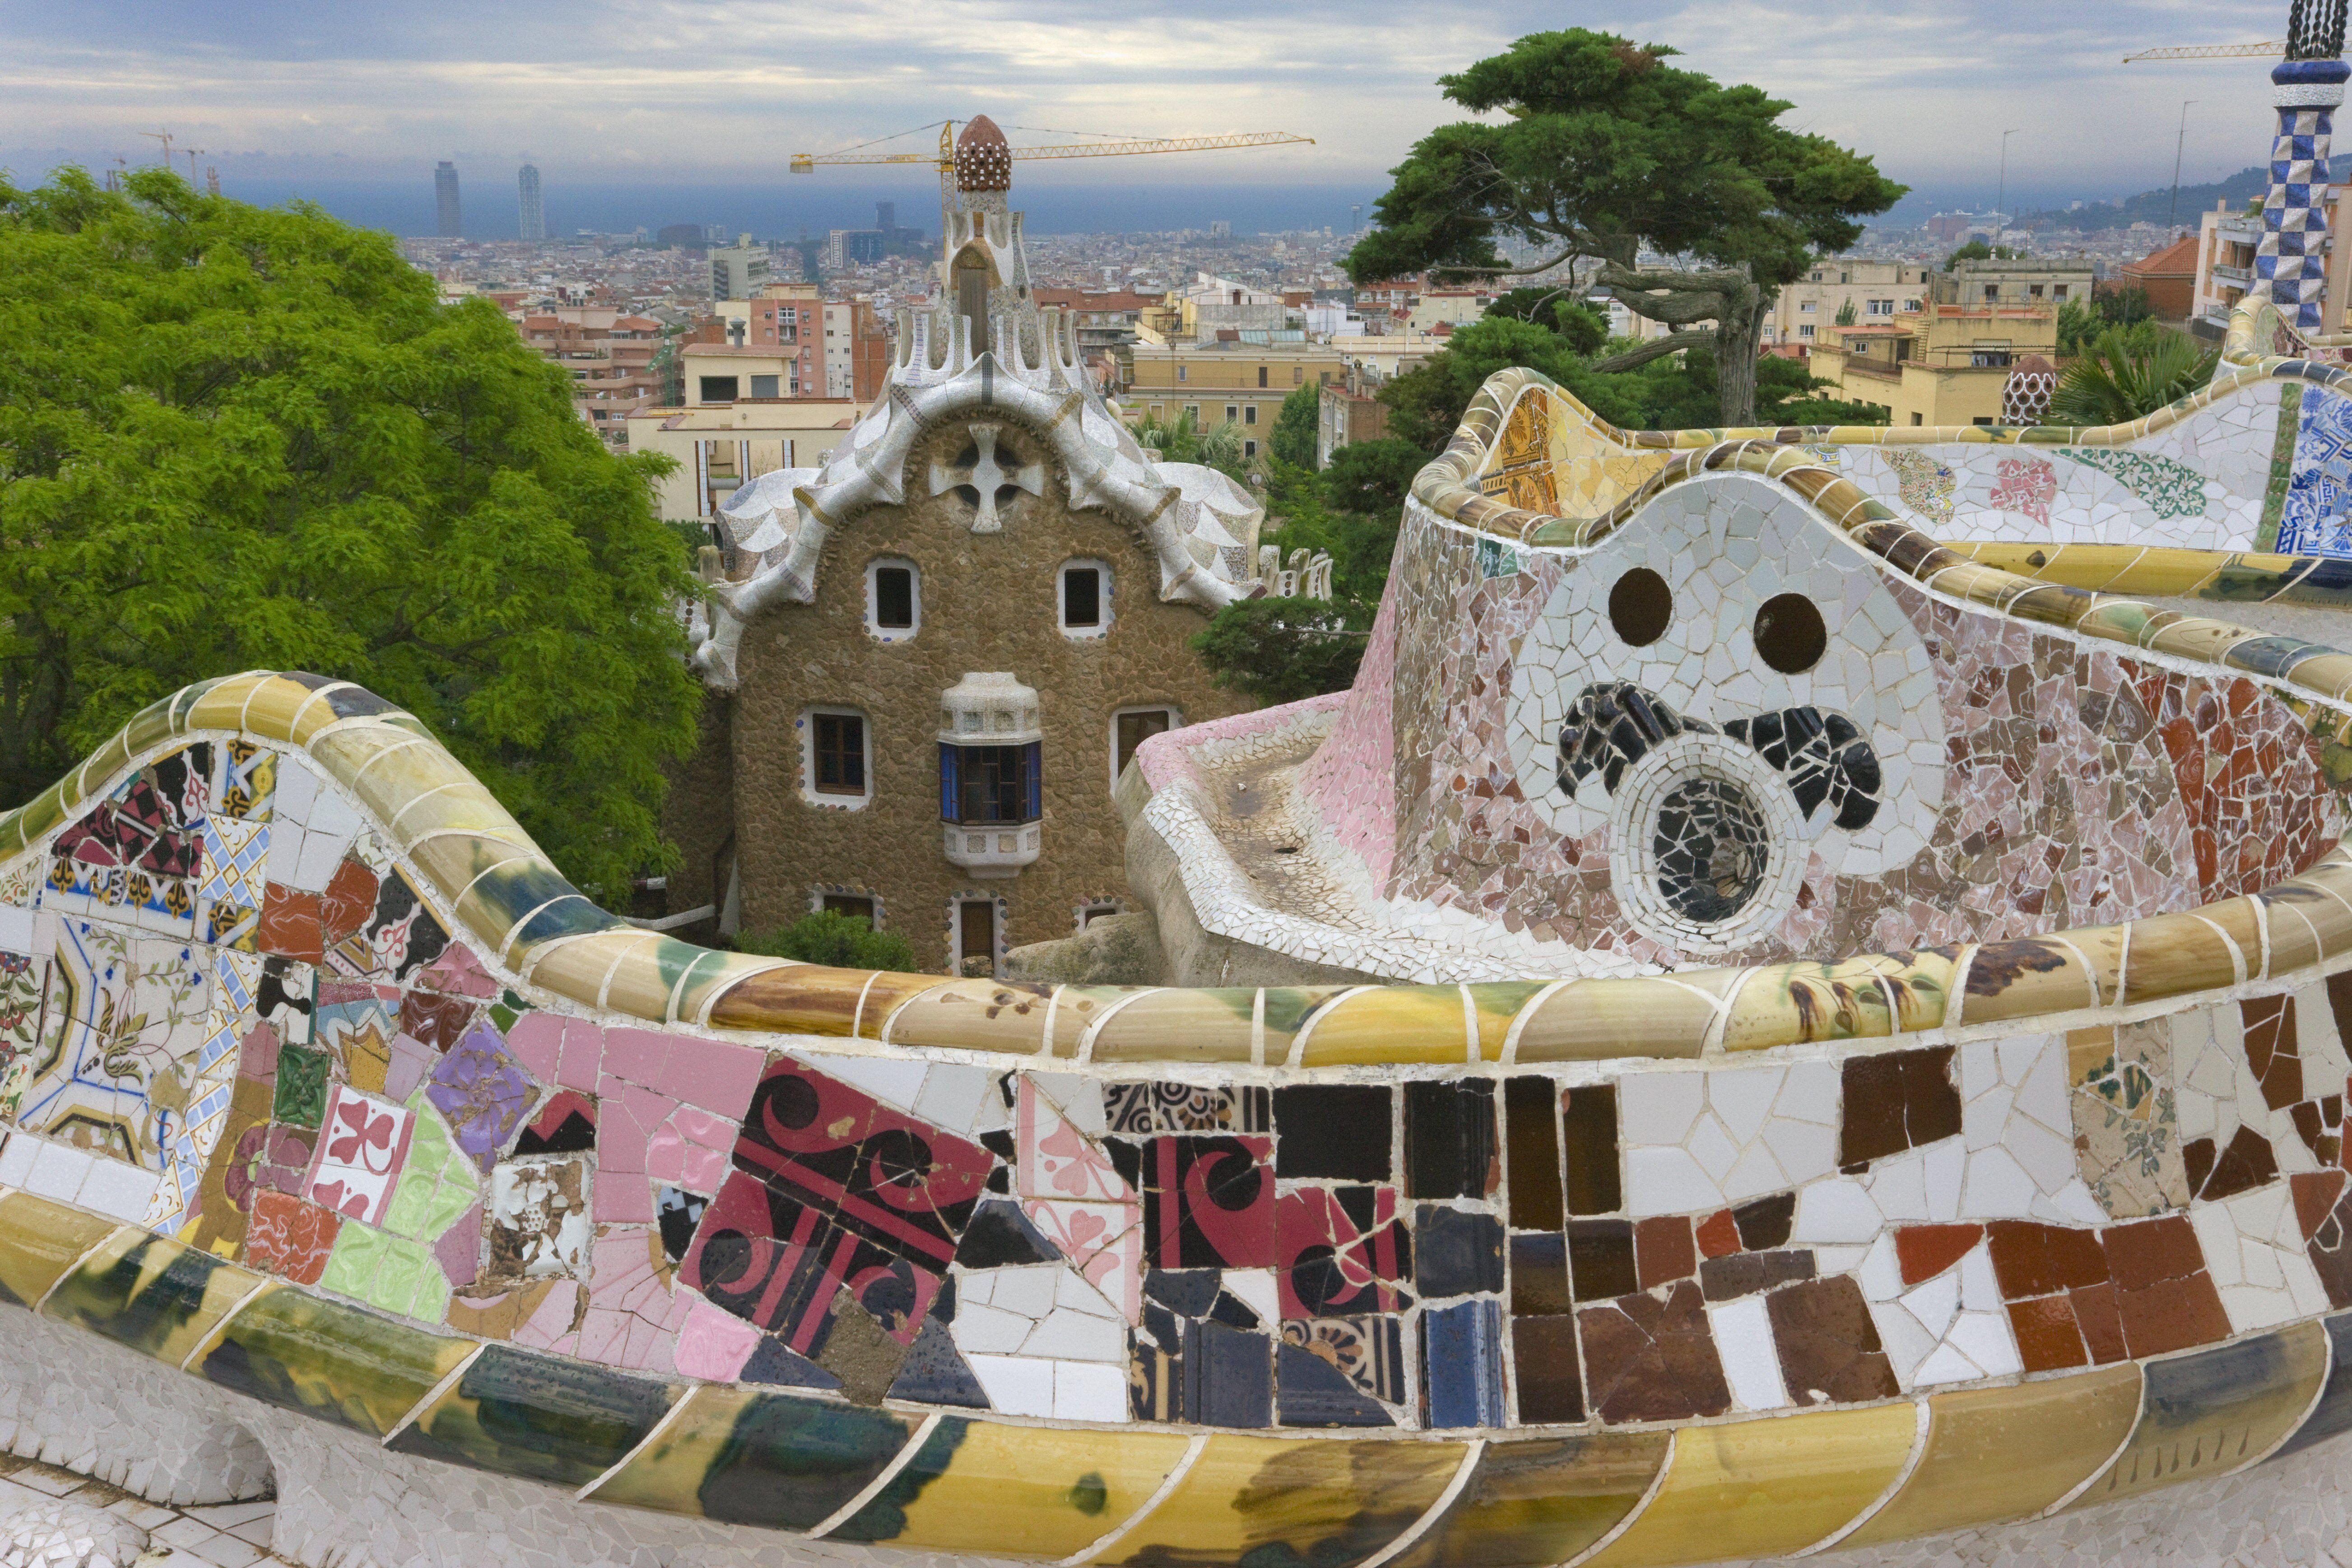 Parque Güell by Antoni Gaudí in Barcelona, Spain